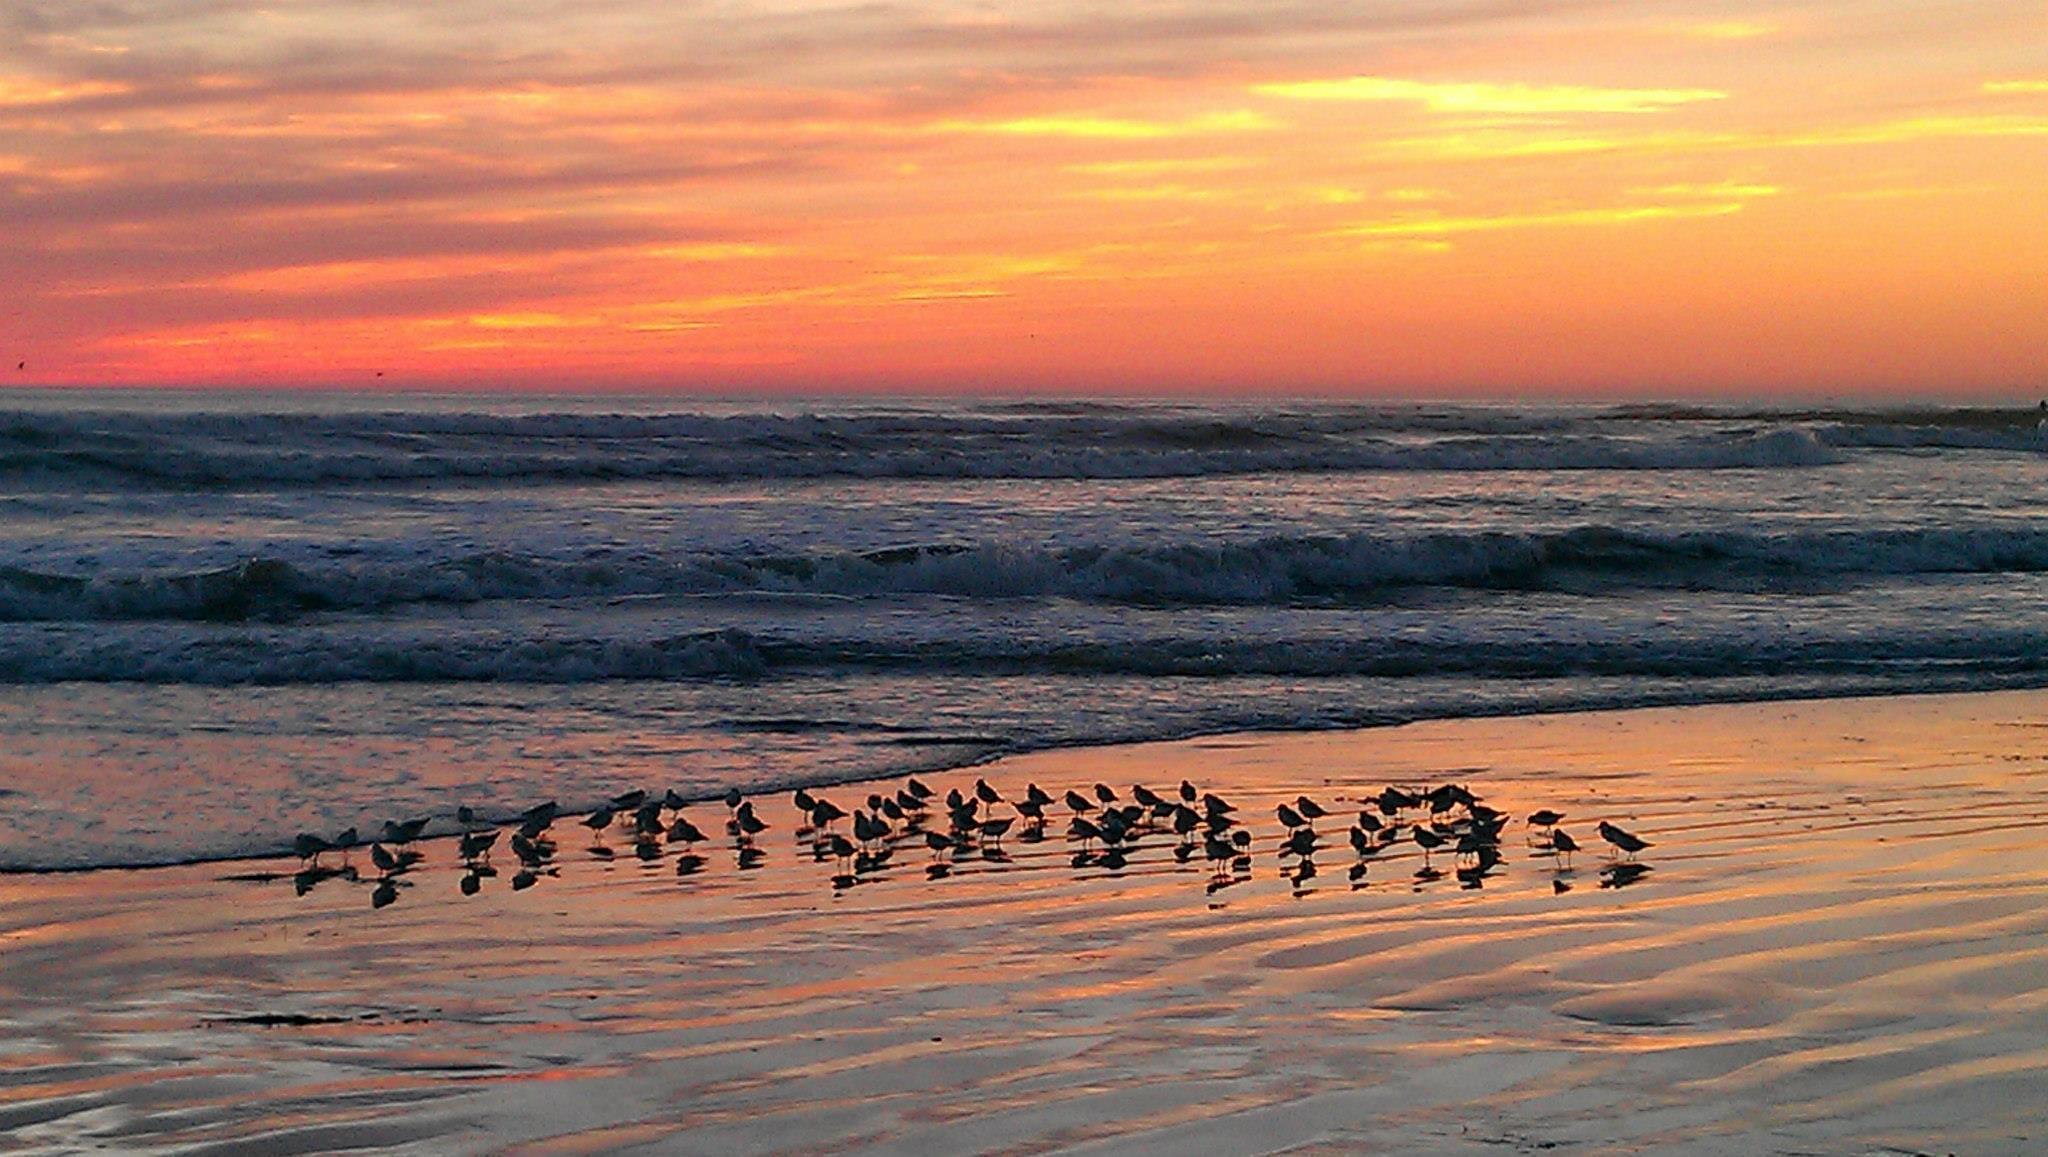 beach birds by jodi.thrasher1